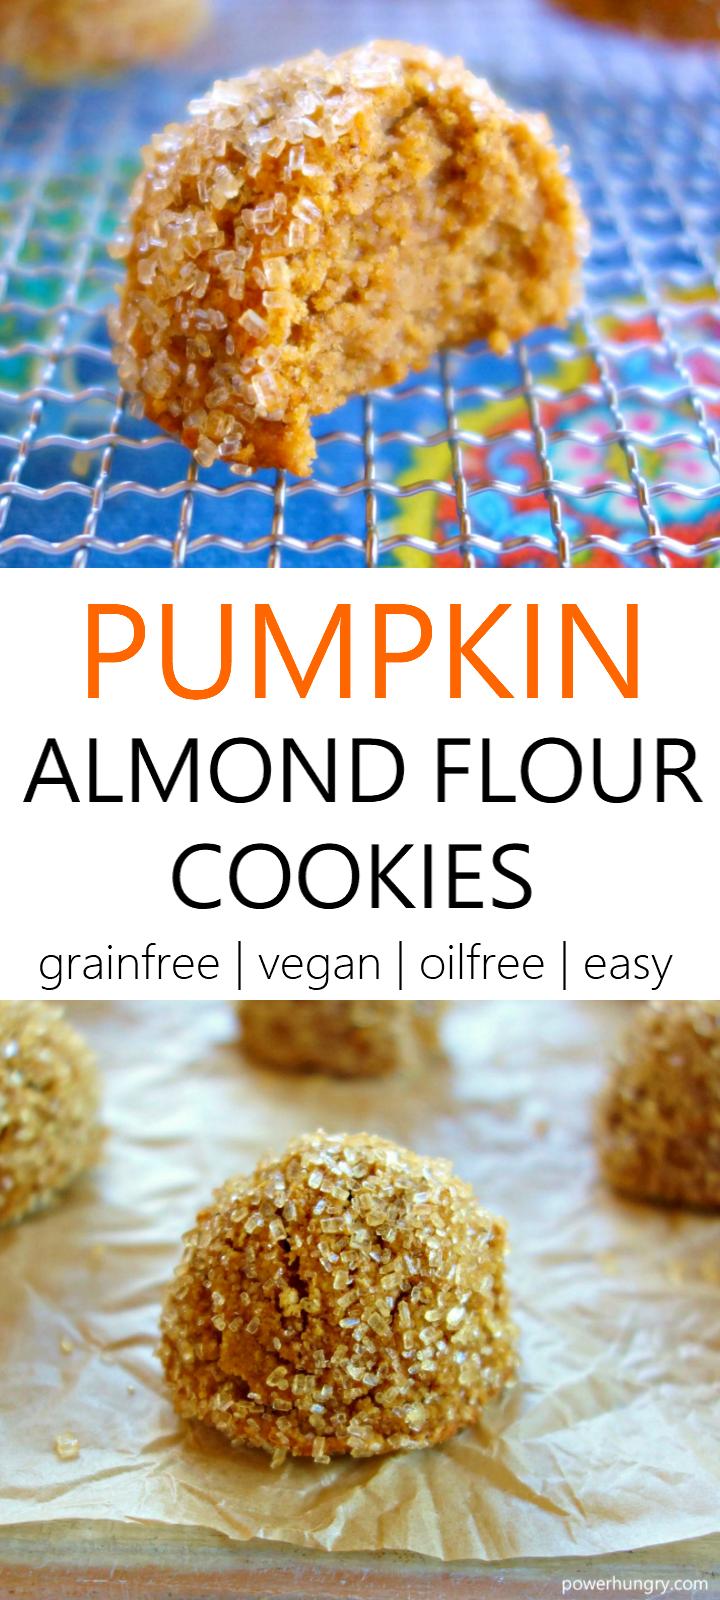 Pumpkin Almond Flour Cookies Vegan Grain Free Oil Free